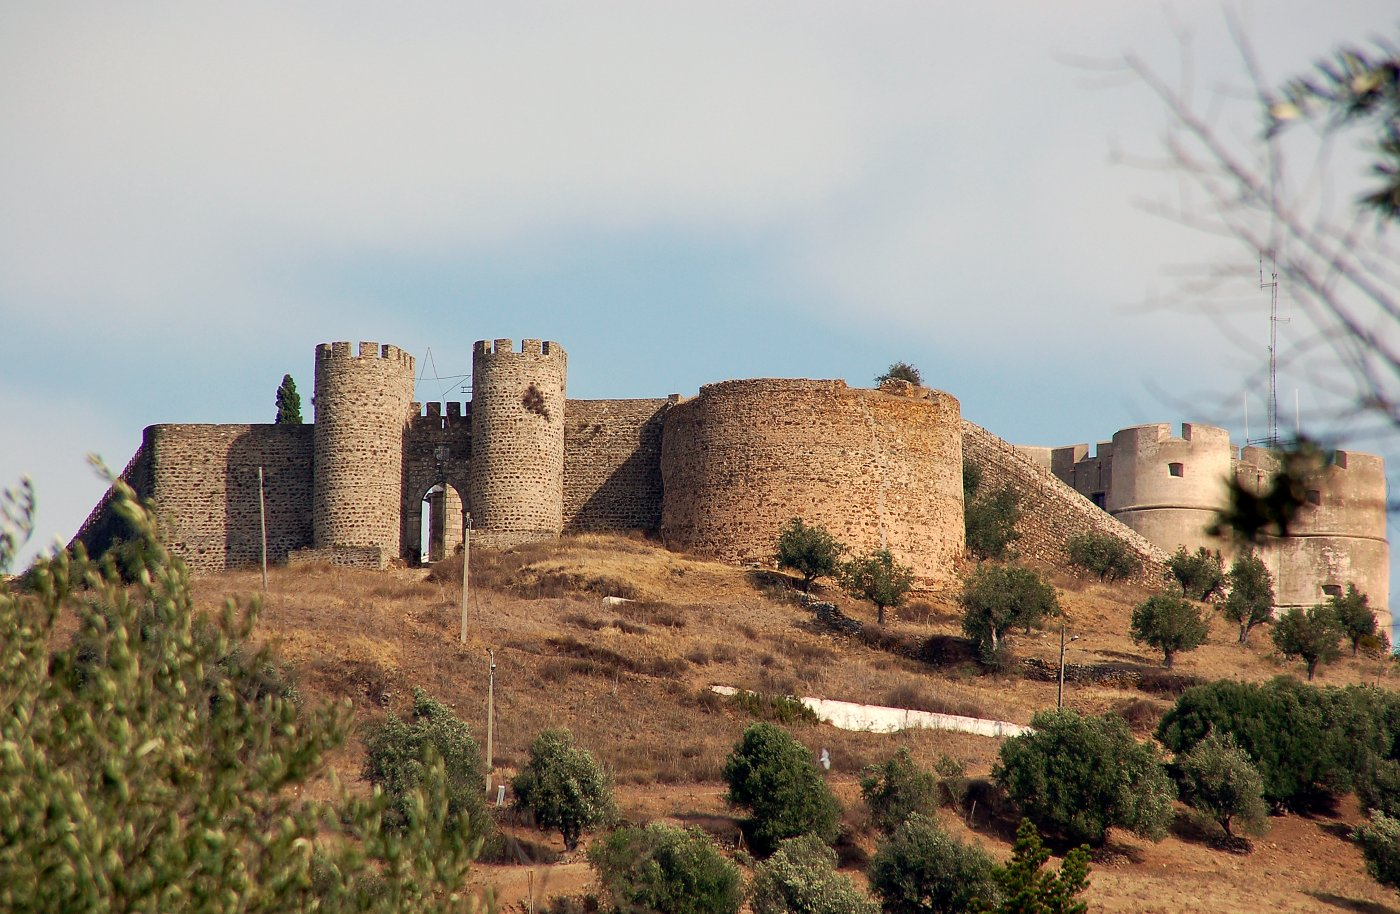 Фото Замок Эвора-Монте. Португалия, Evora, Evora Monte